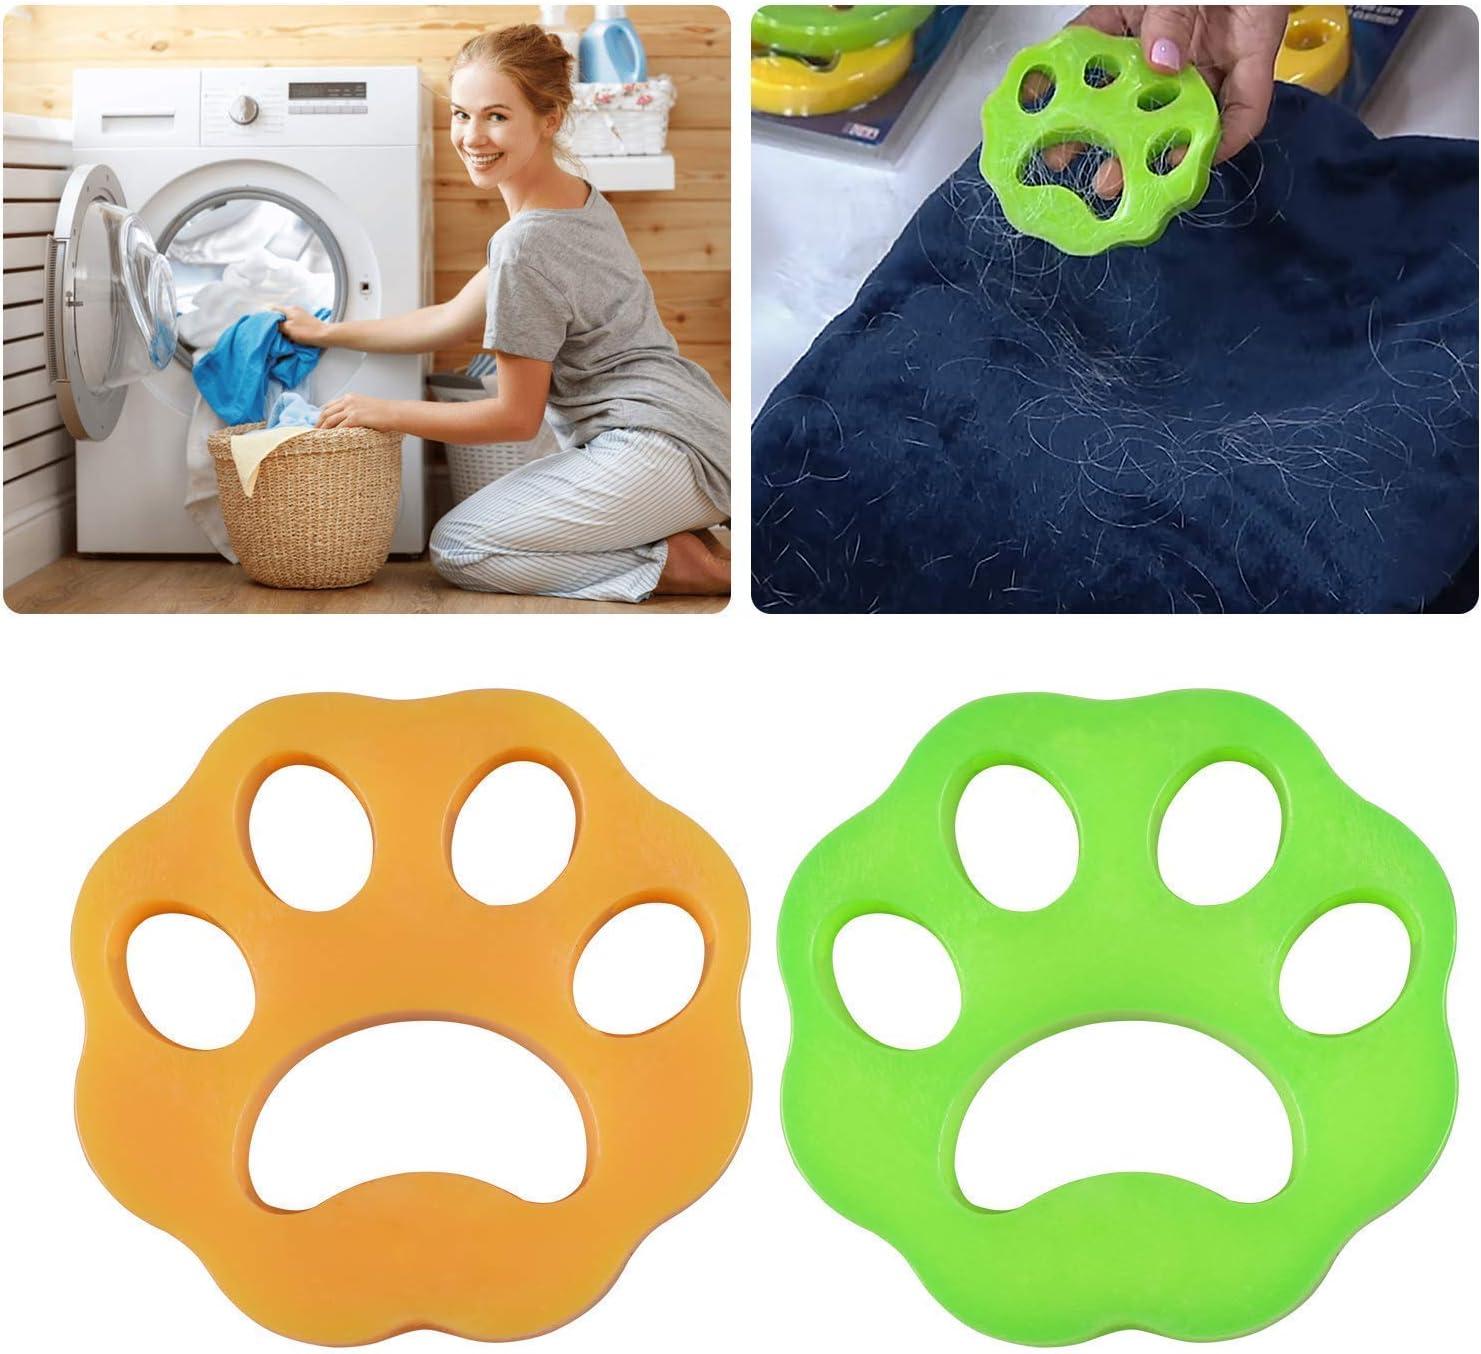 Zhybca - Eliminador de pelo de mascotas para lavandería, lavadora, recogedor de pelo de mascotas, removedor de pelo de mascotas para ropa/ropa de cama, bola de limpieza reutilizable 2020 Limpiador.